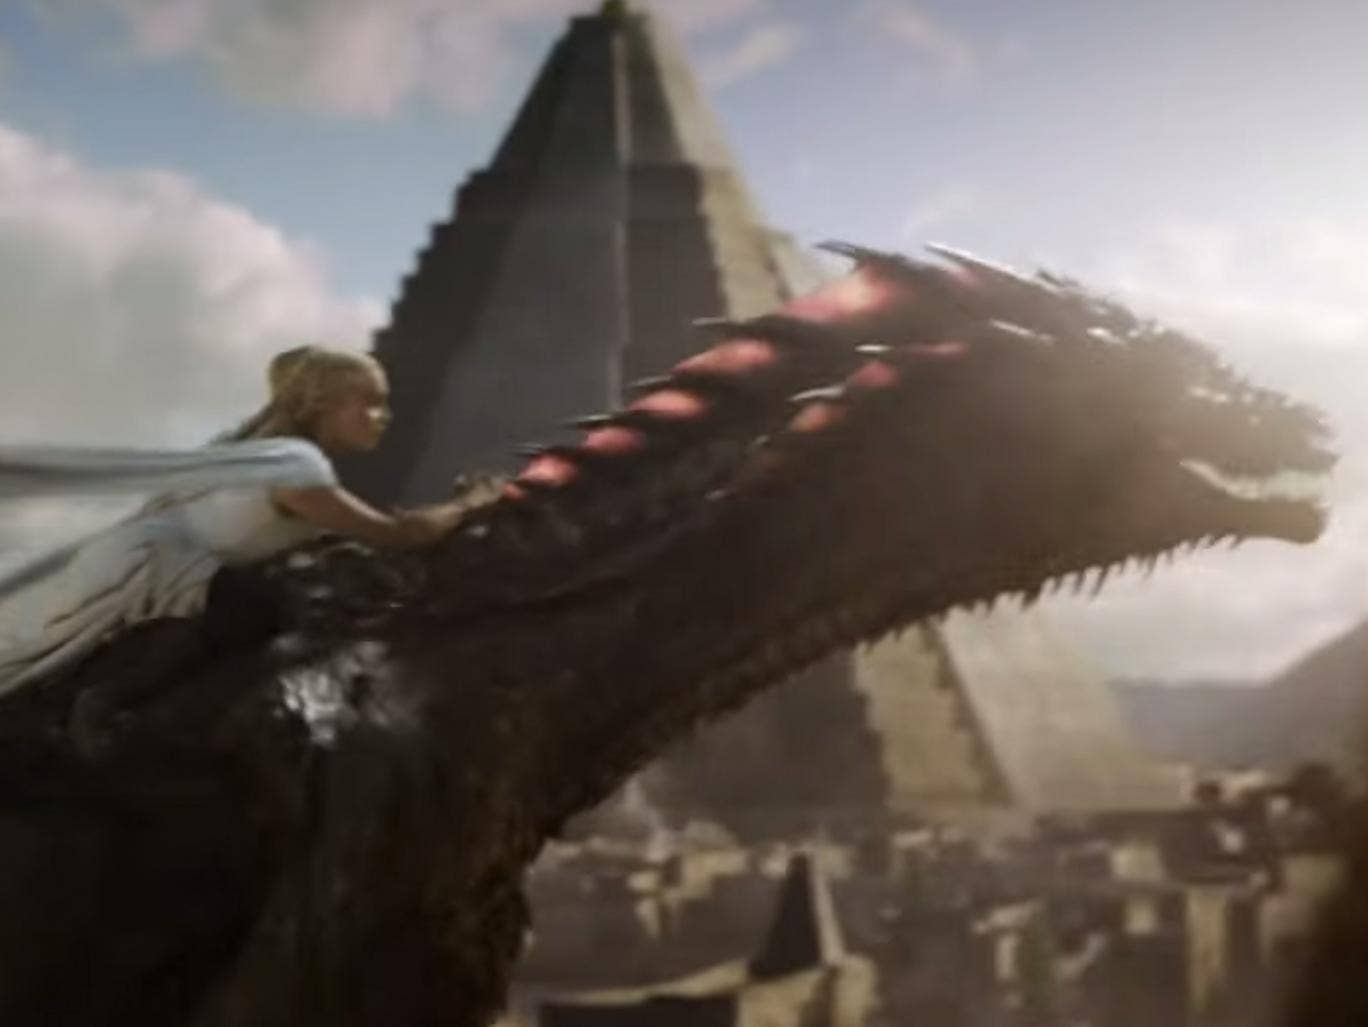 Game Of Thrones Season 5: Daenerys' Dragon Ride Sets